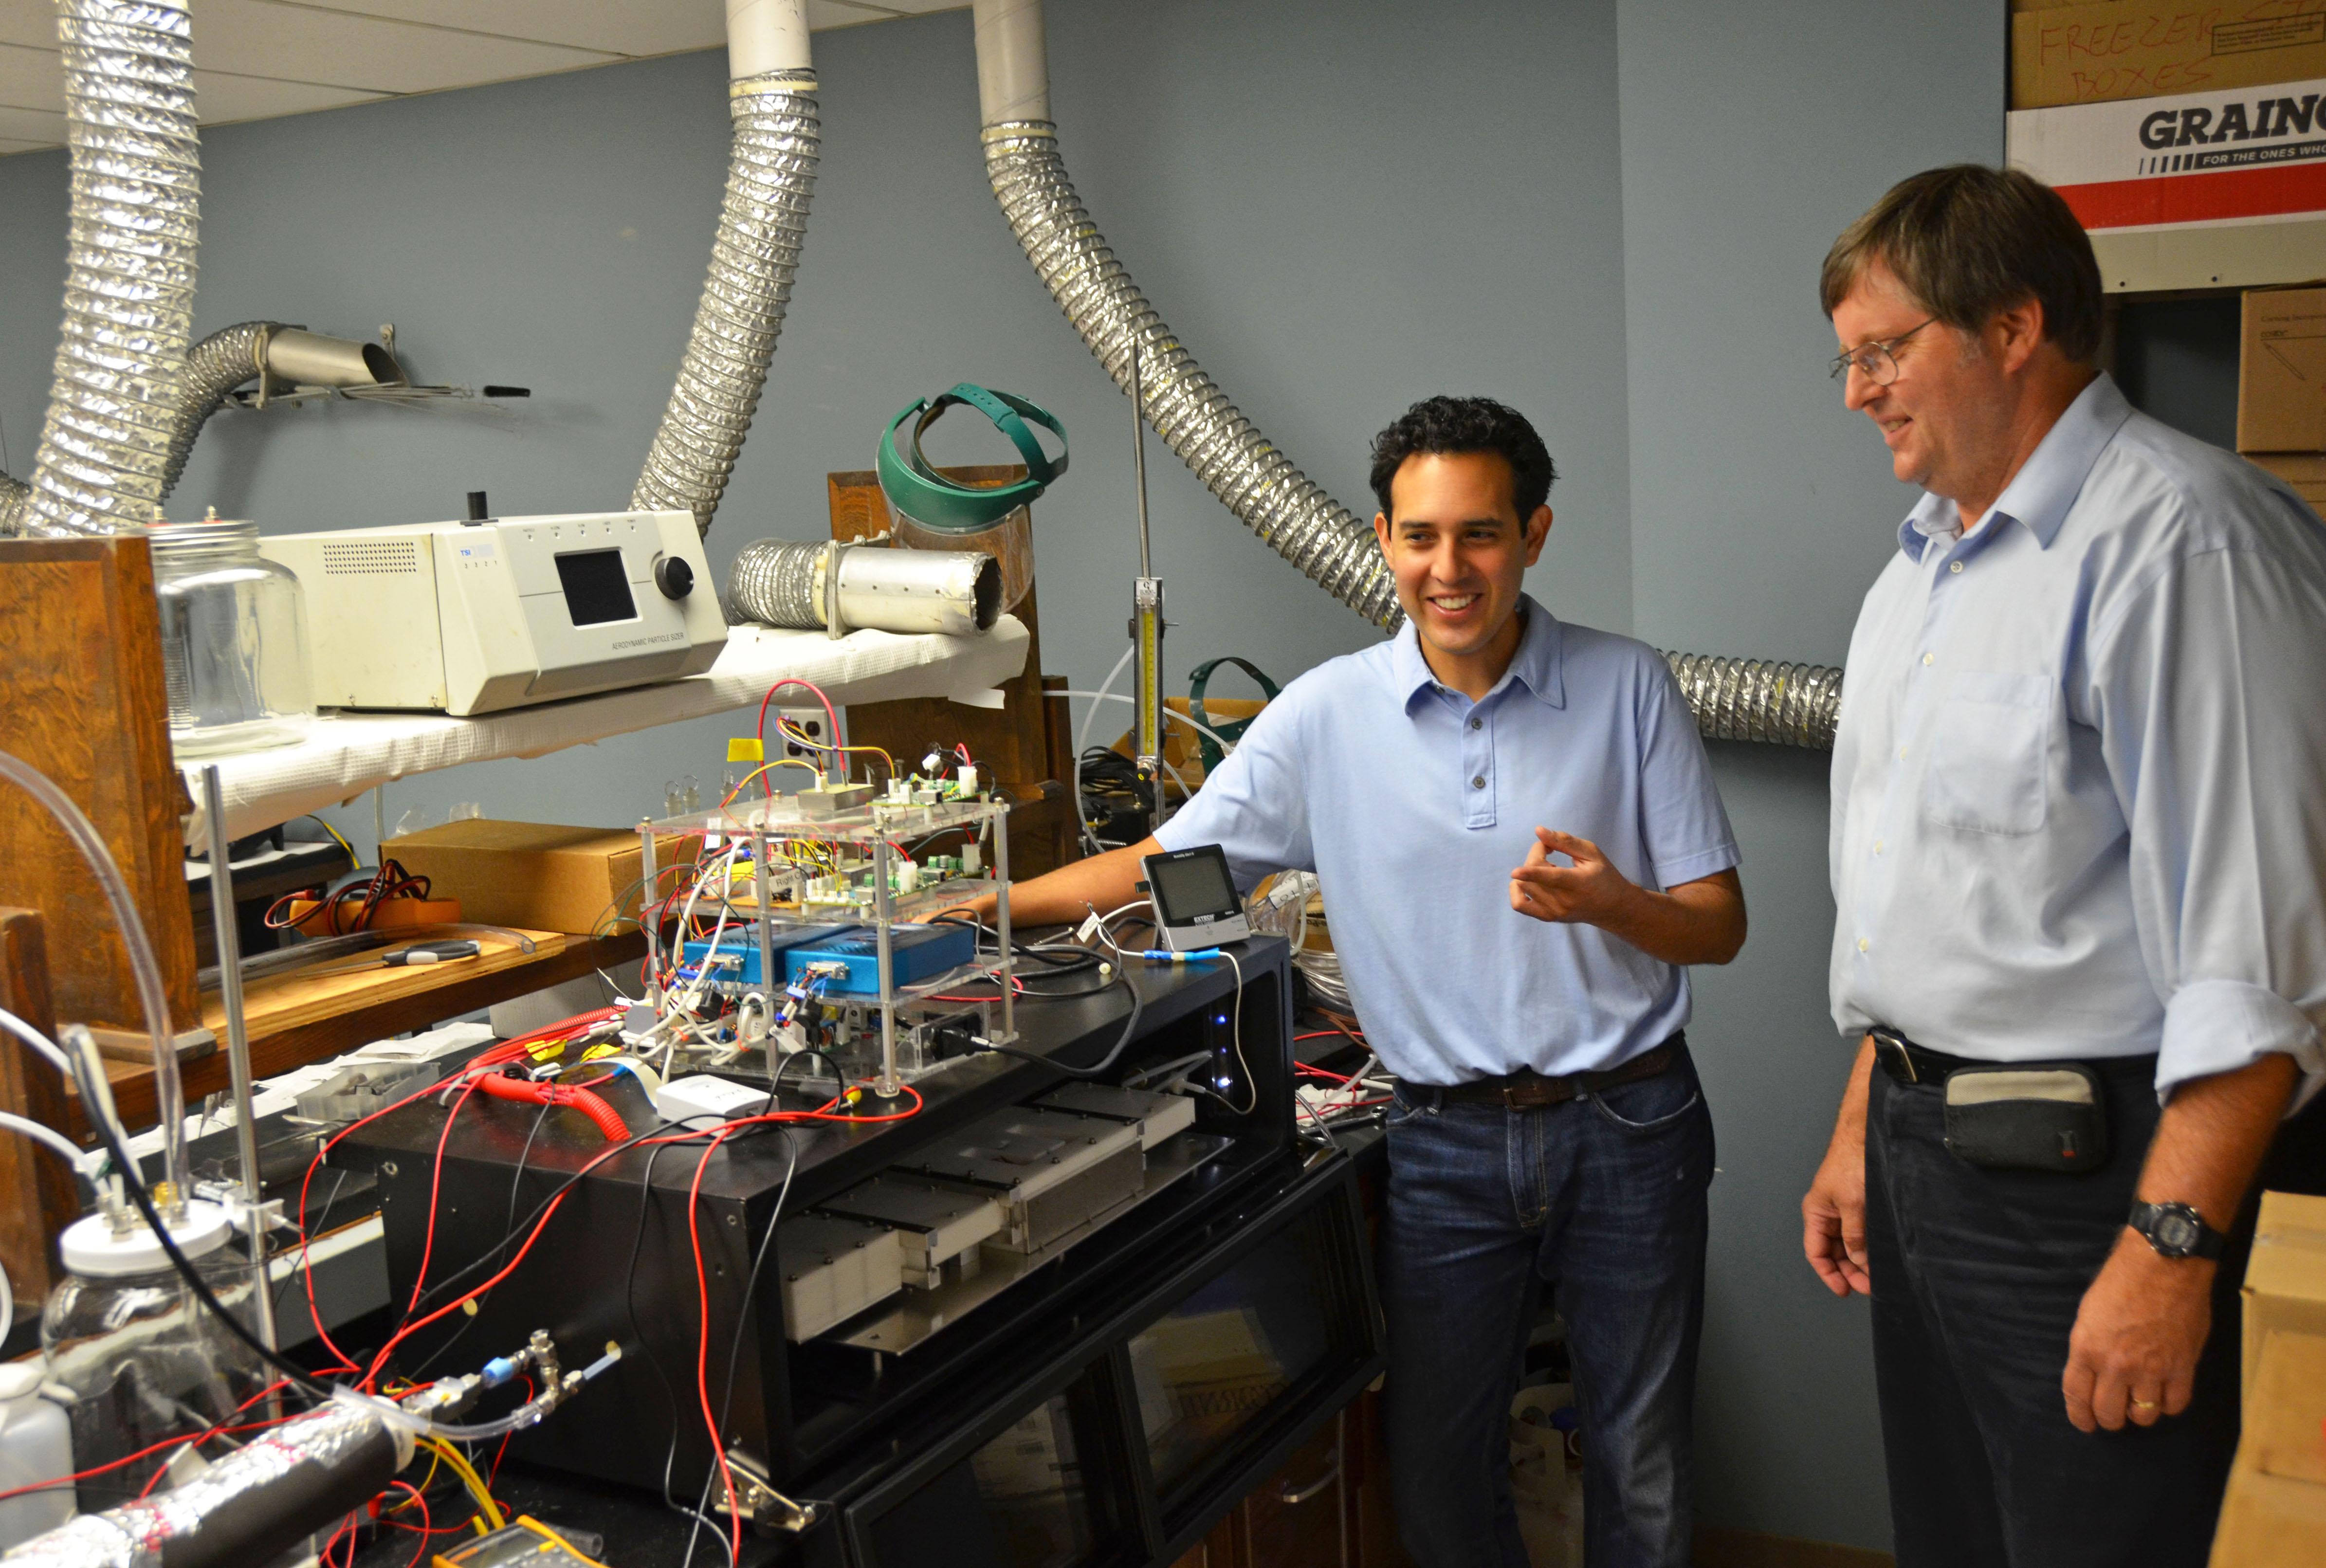 Will Vizuete, PhD (left) and Ken Sexton, PhD, discuss an experiment in progress.